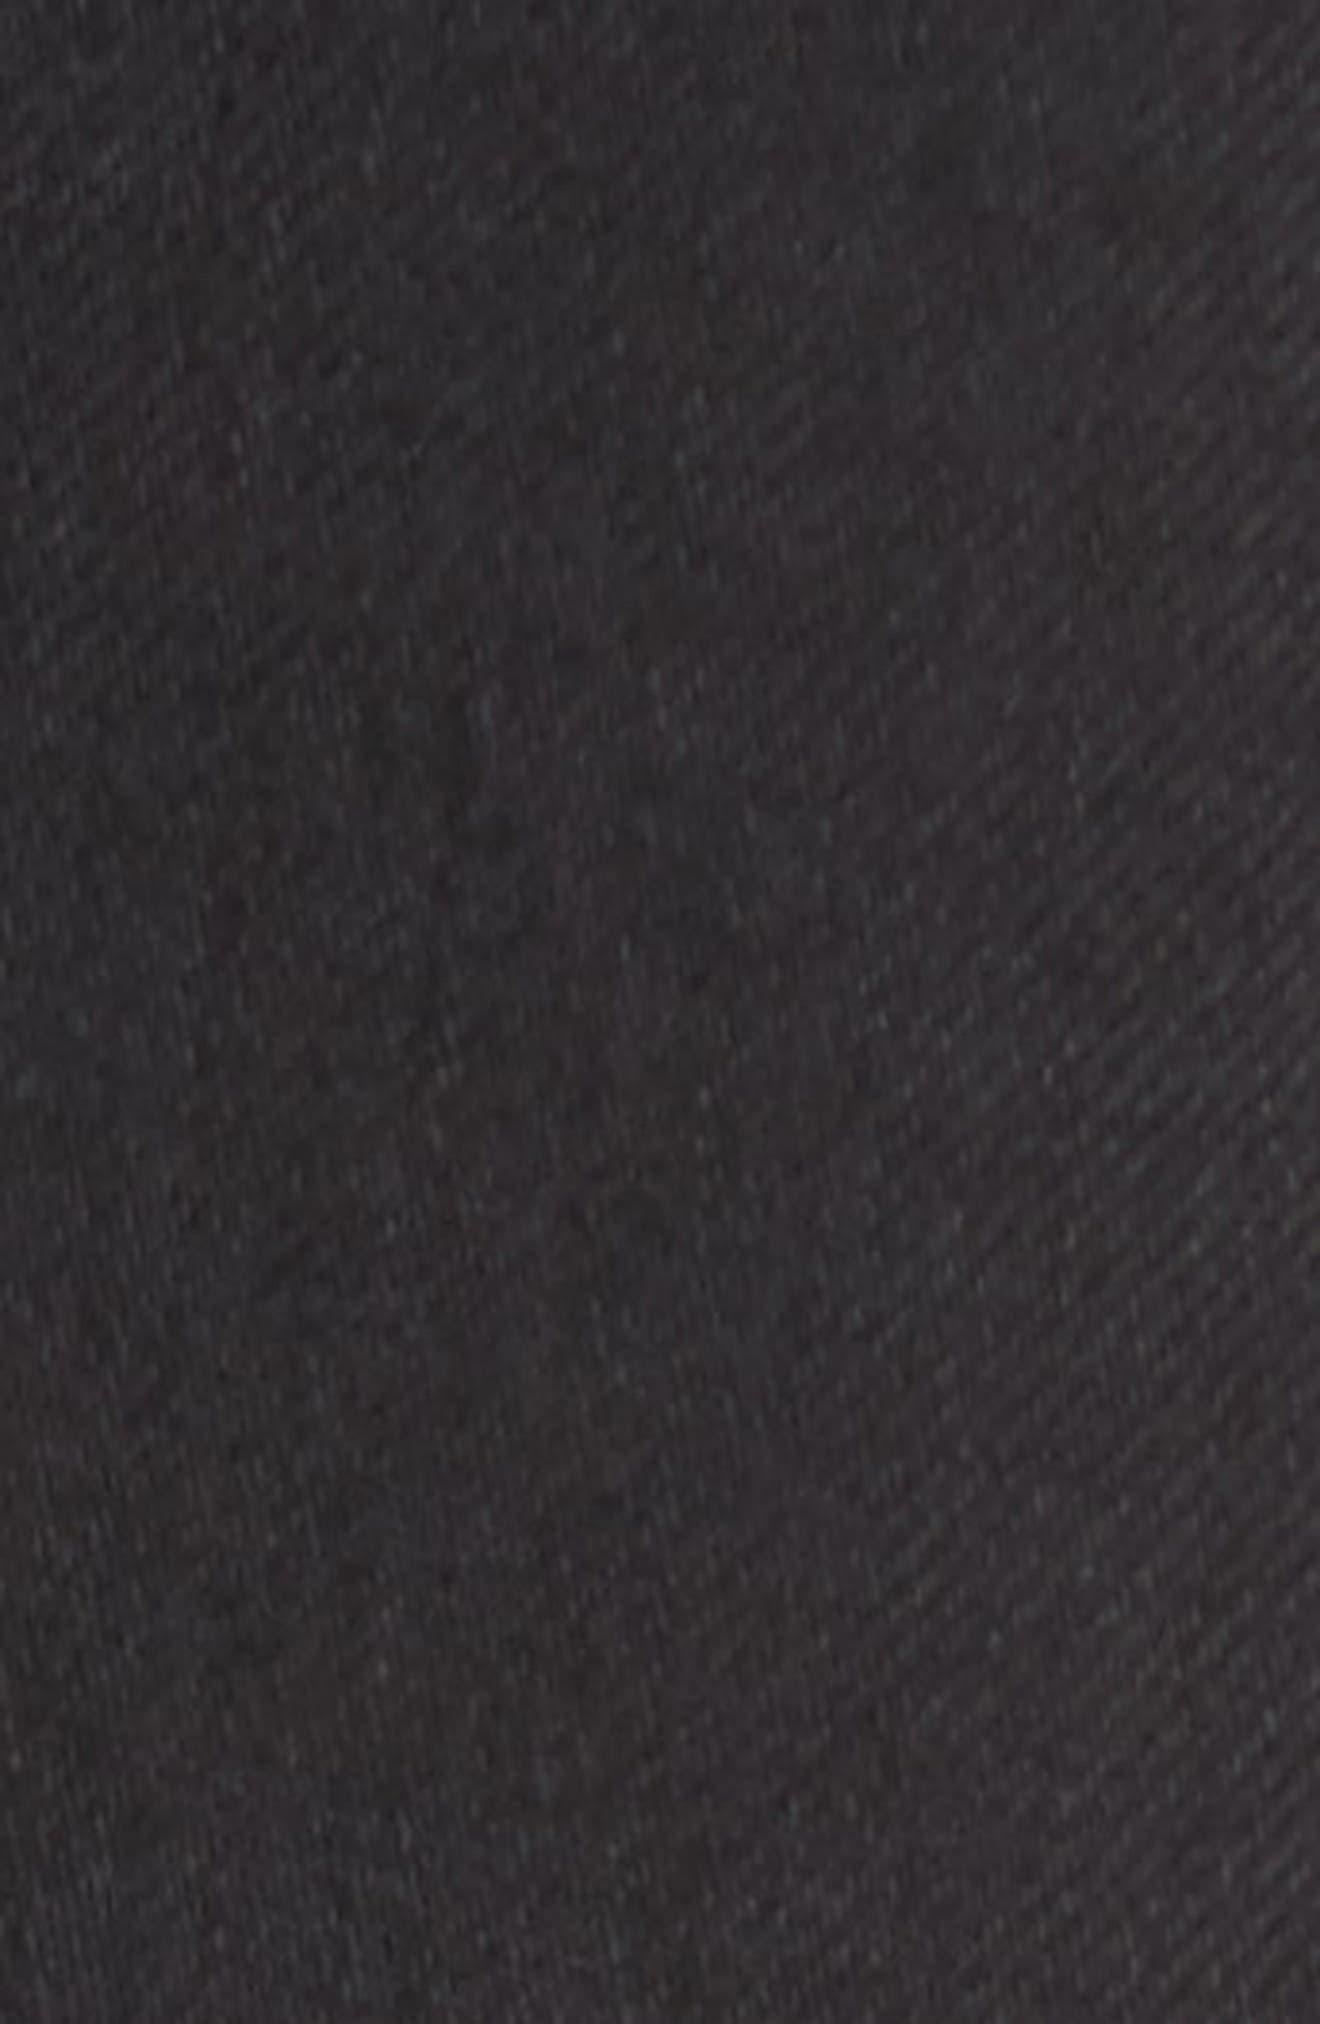 Apex Slouchy Slim Fit Jeans,                             Alternate thumbnail 5, color,